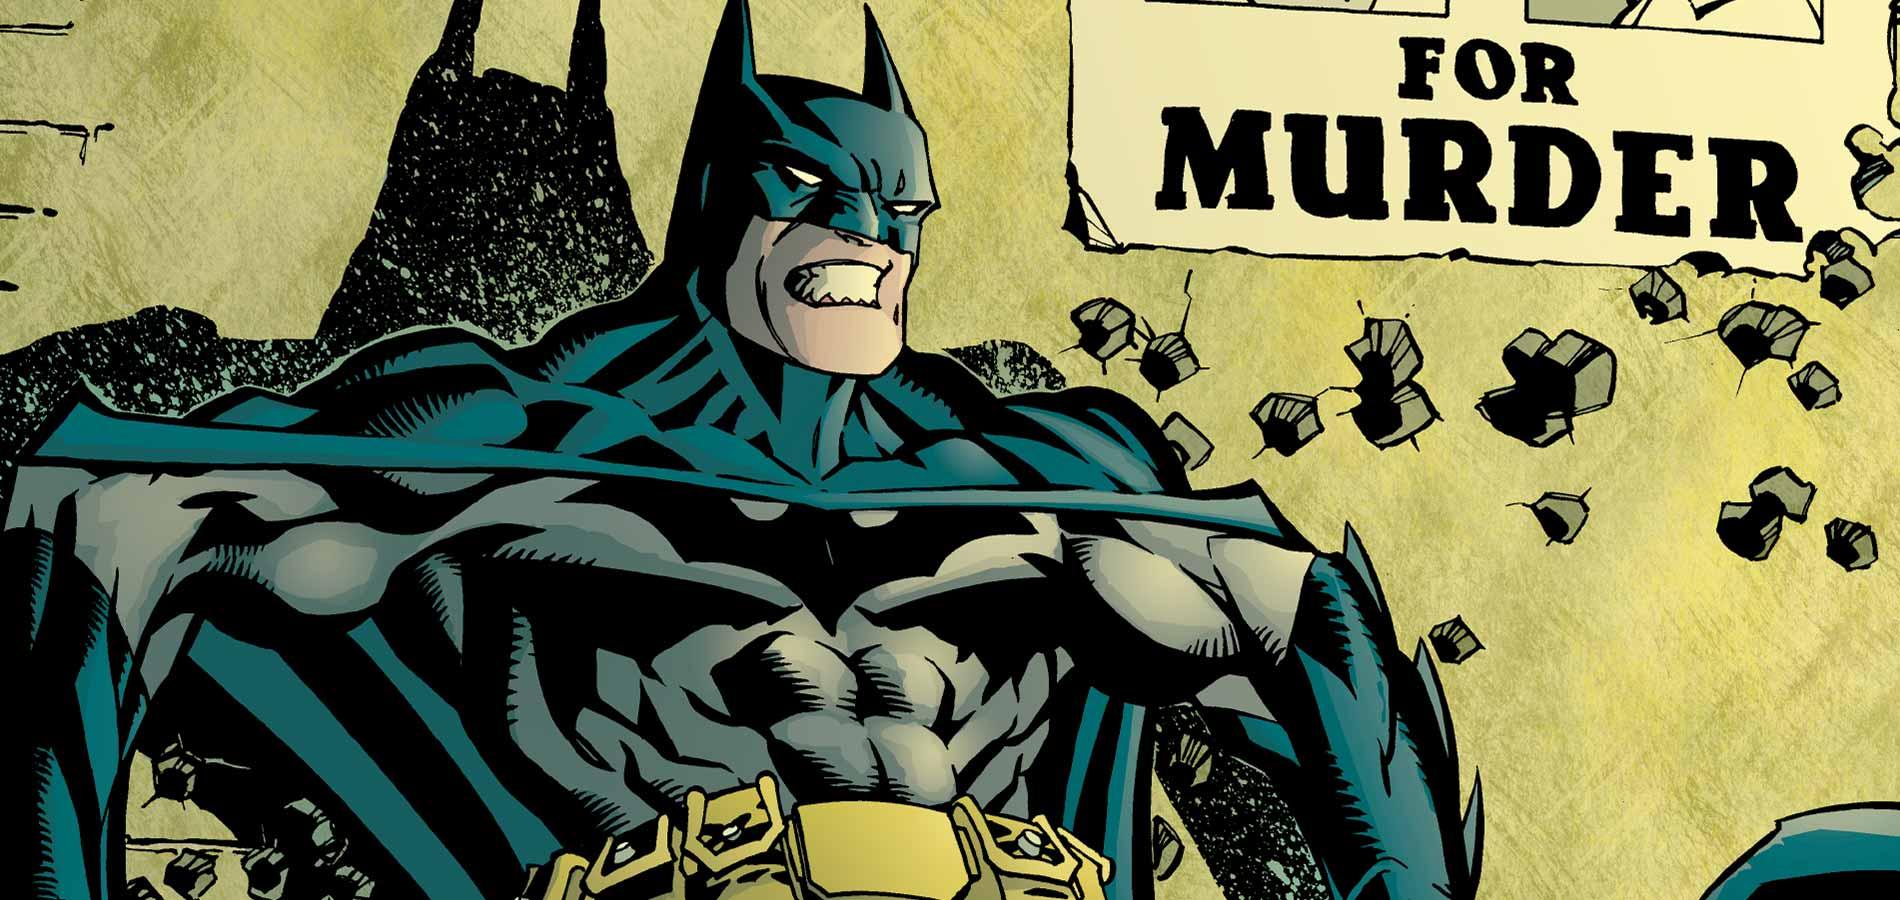 Batman Meurtrier, fugitif